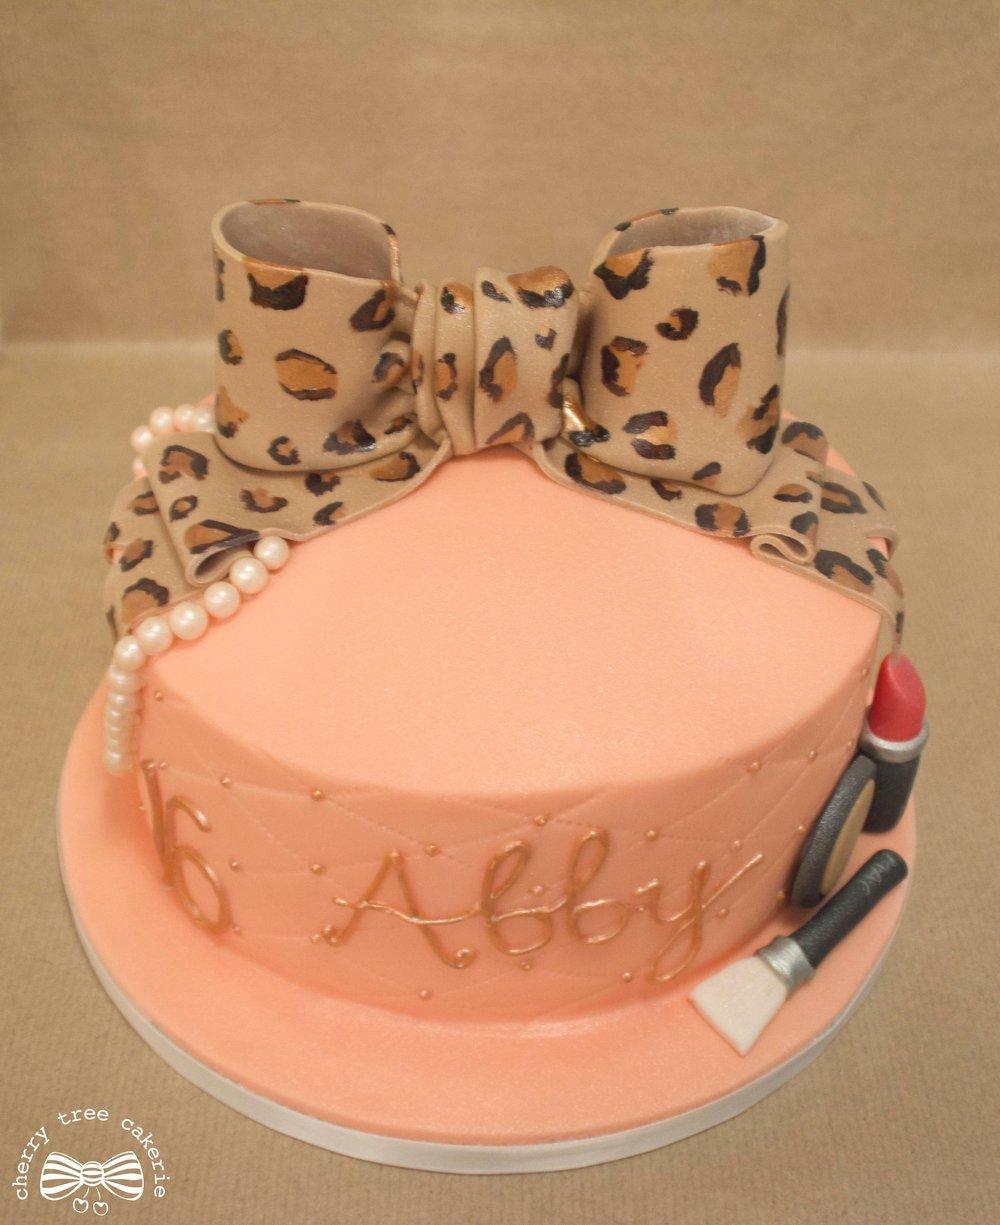 Bow-and-make-up-birthday-cake